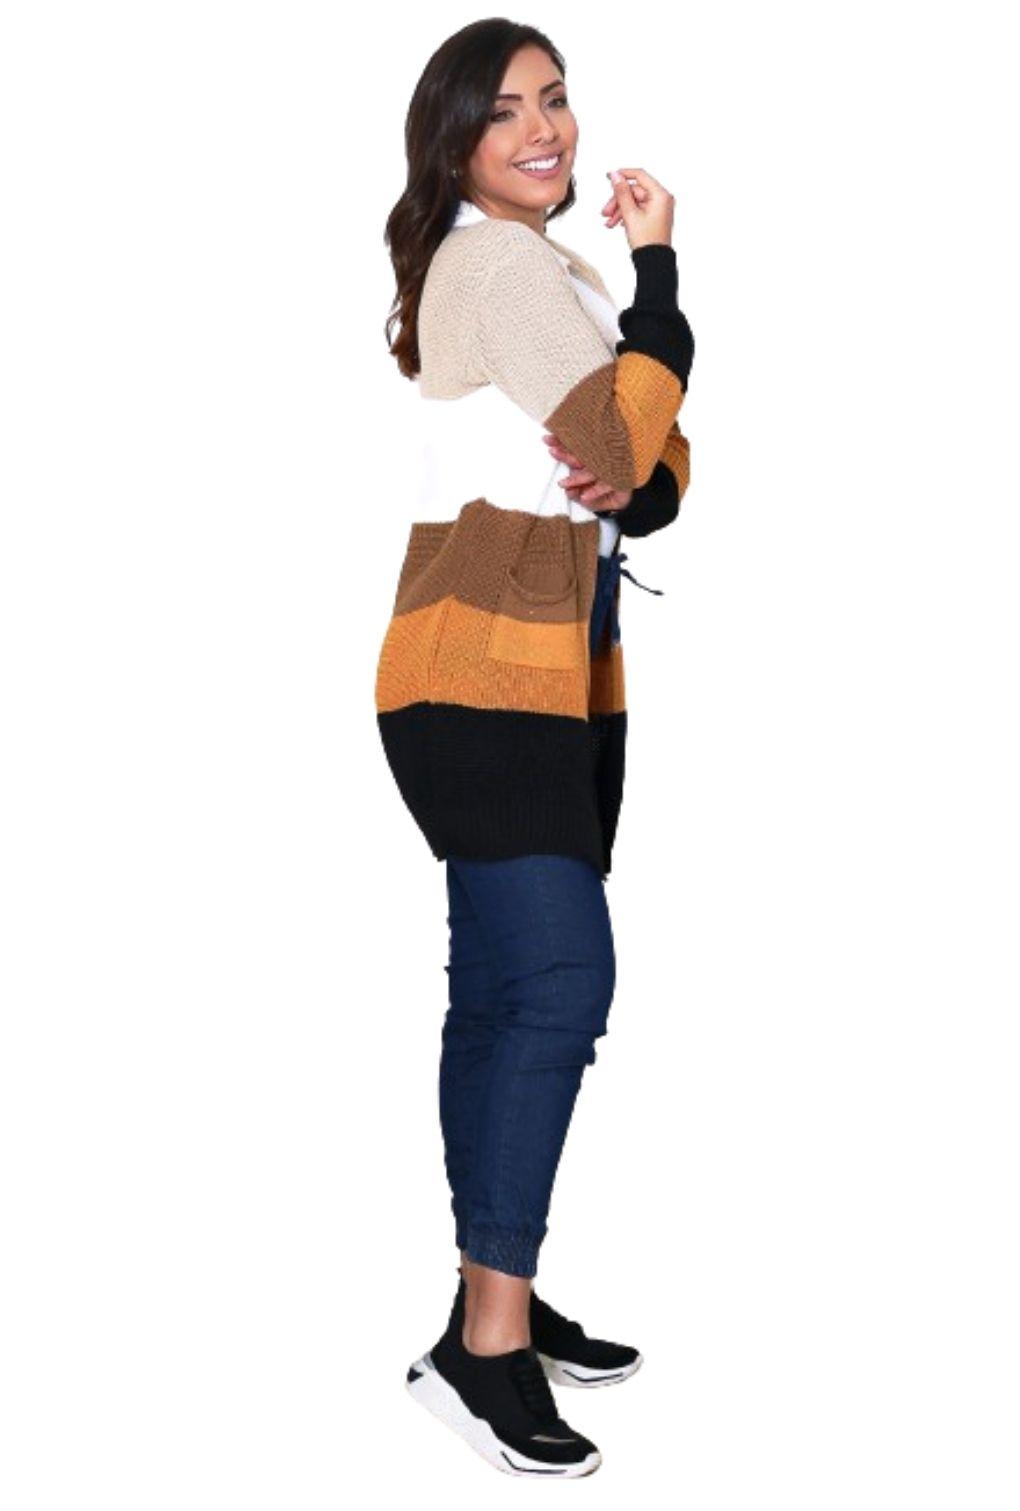 Casaco Inverno Feminino Listrado Colorido Rainbow com Bolso  - ModaStore | Moda Feminina